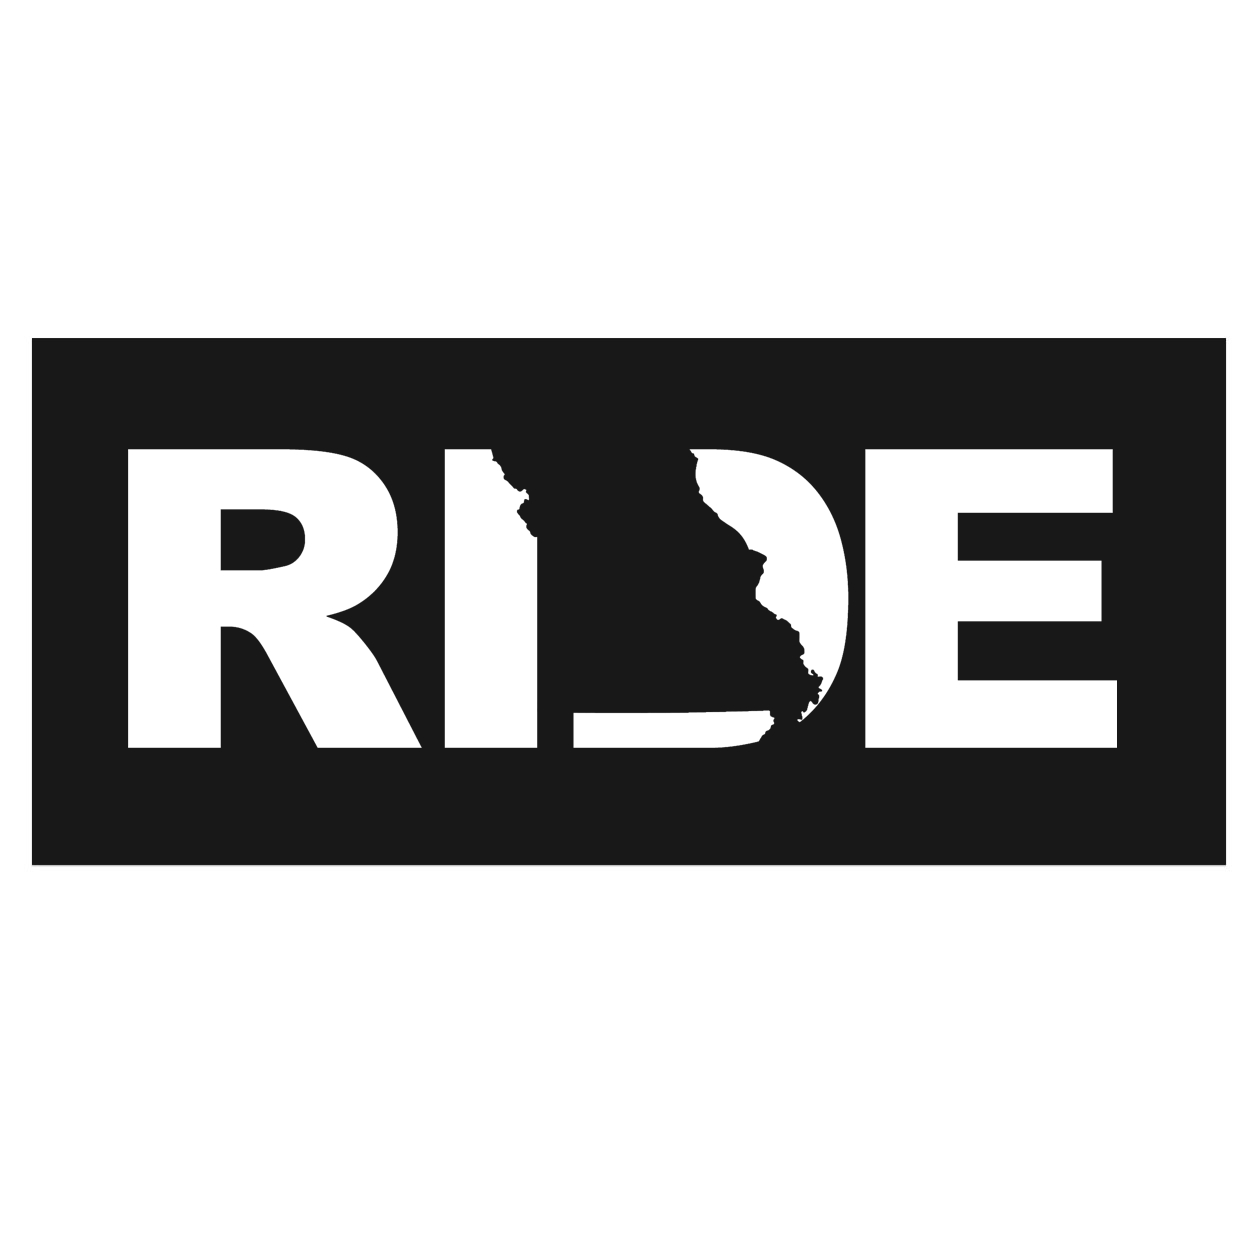 Ride Missouri Classic Hardboard Sign (White Logo)